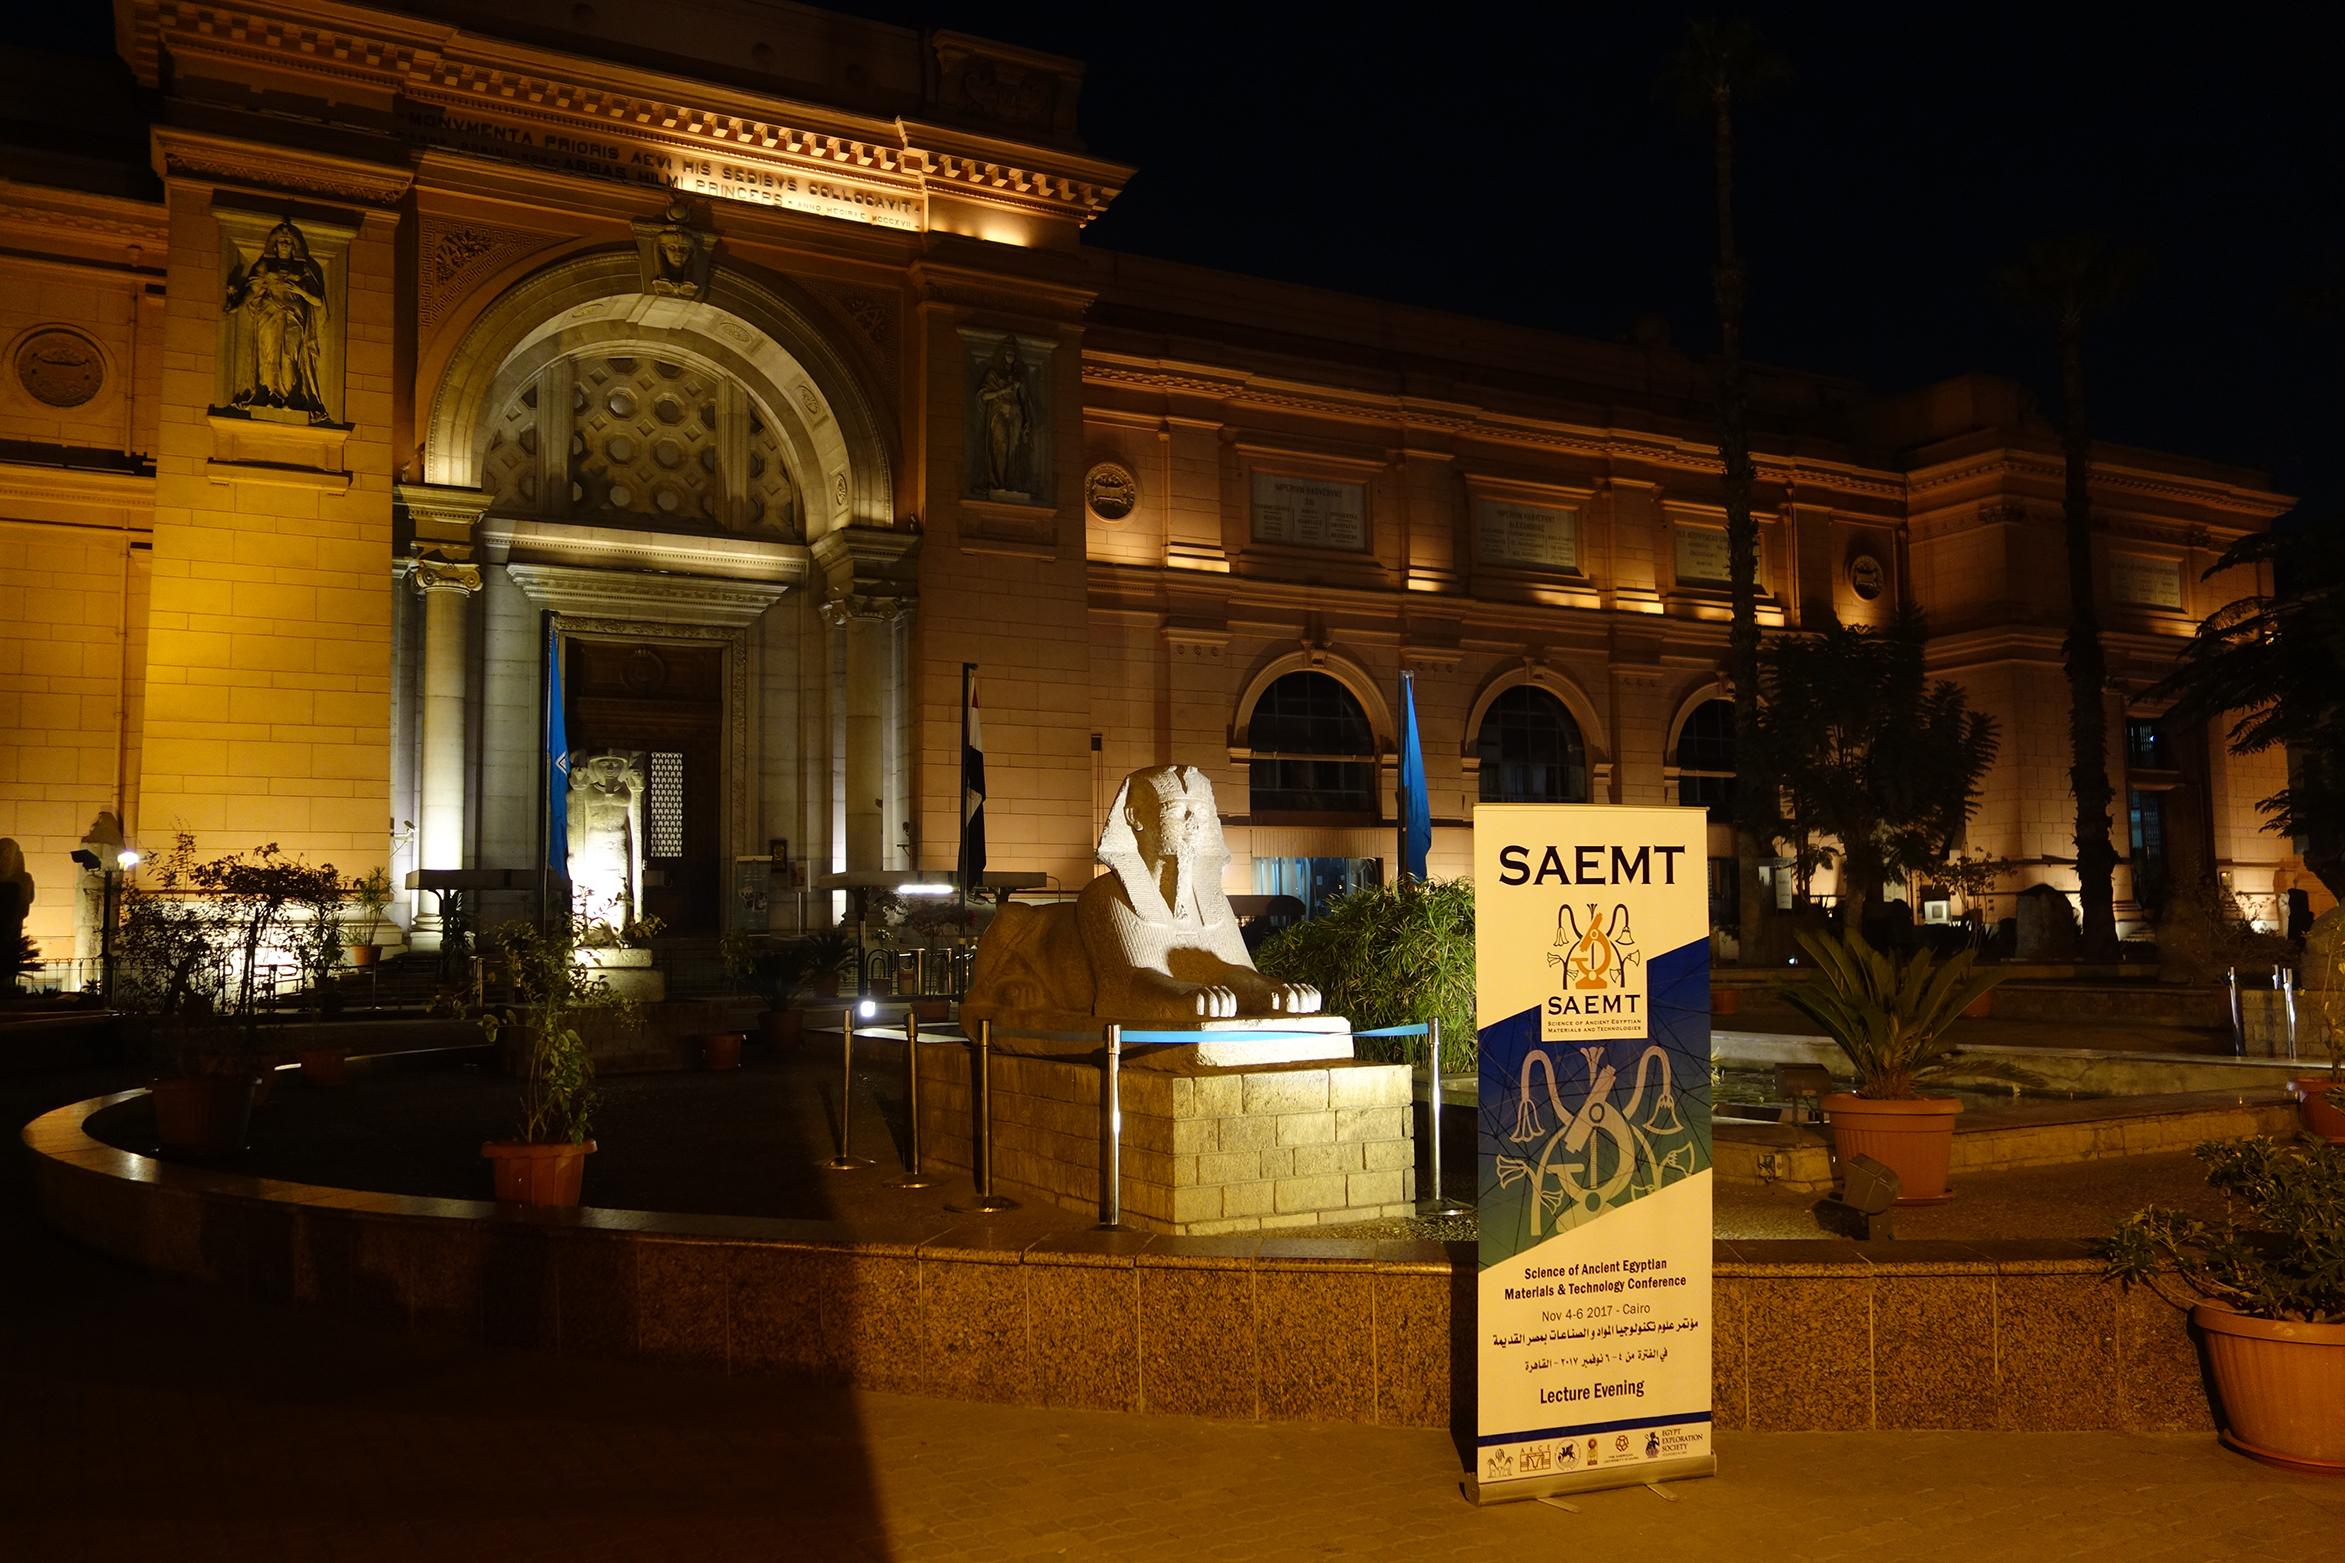 The SAEMT at the Egyptian Museum (photo: Giulio Lucarini)